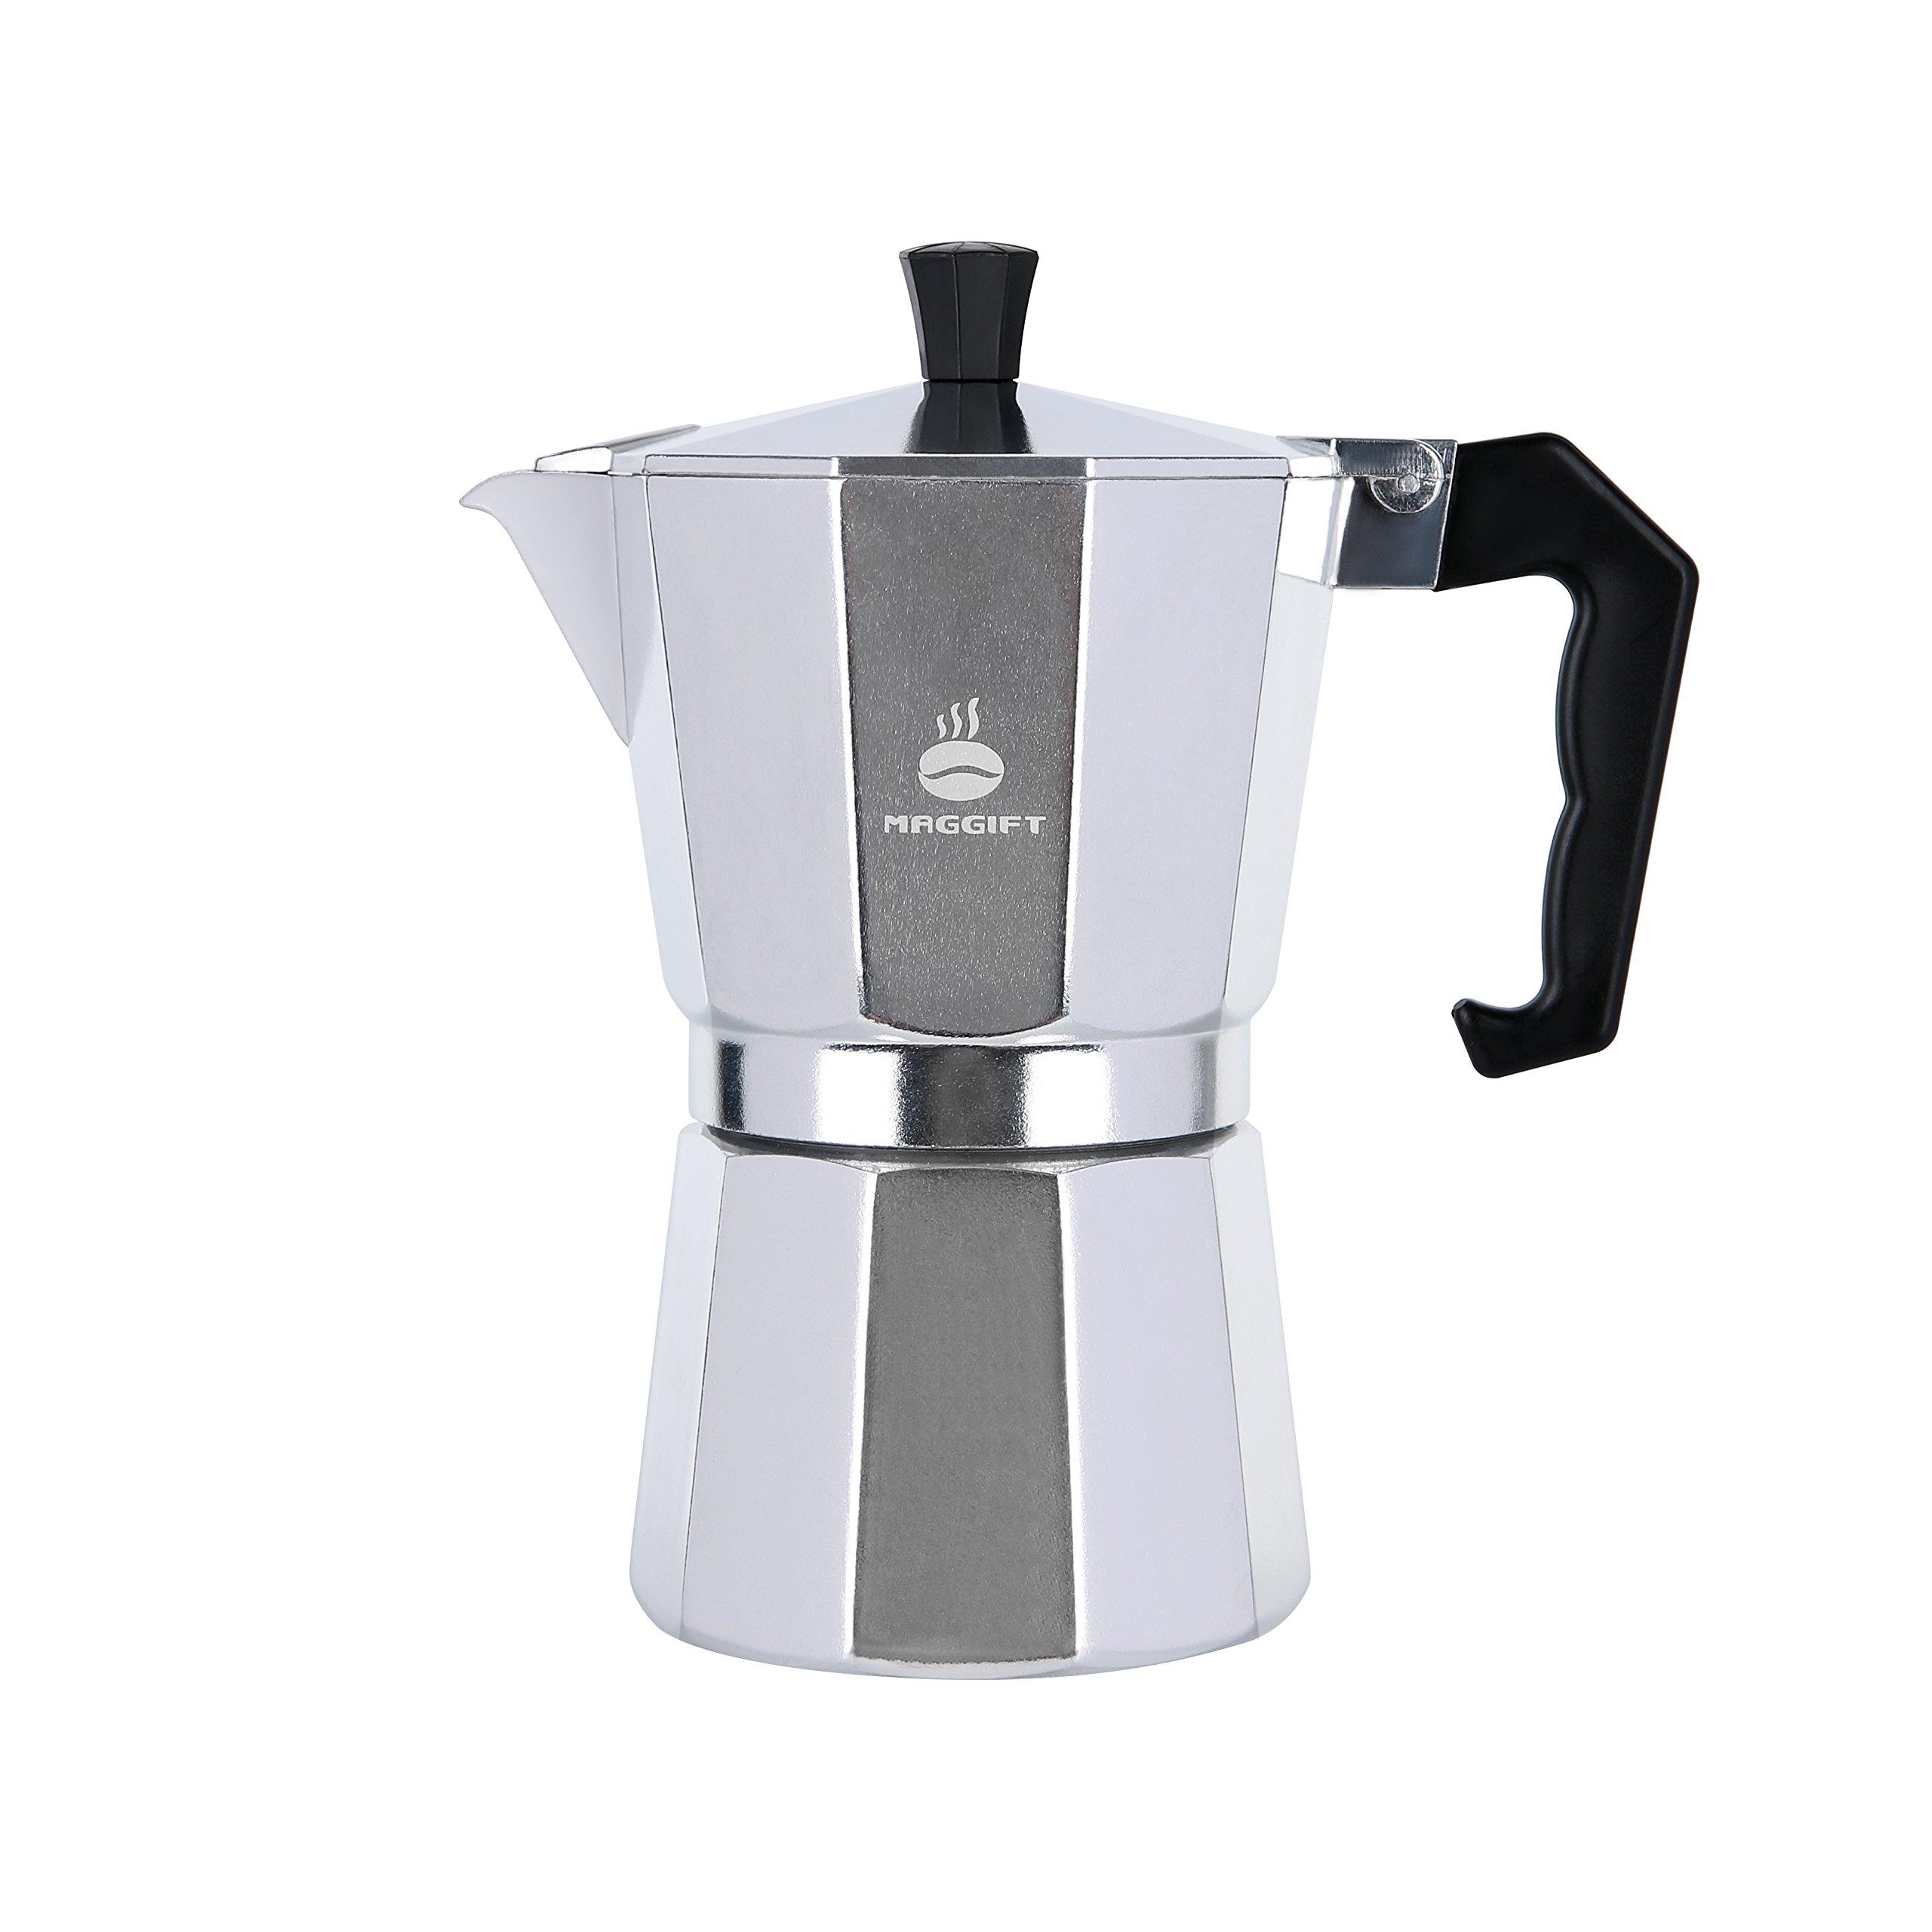 Maggift Stovetop Coffee Maker, Aluminum Italian Moka Pot (6 Cup) by Maggift (Image #2)